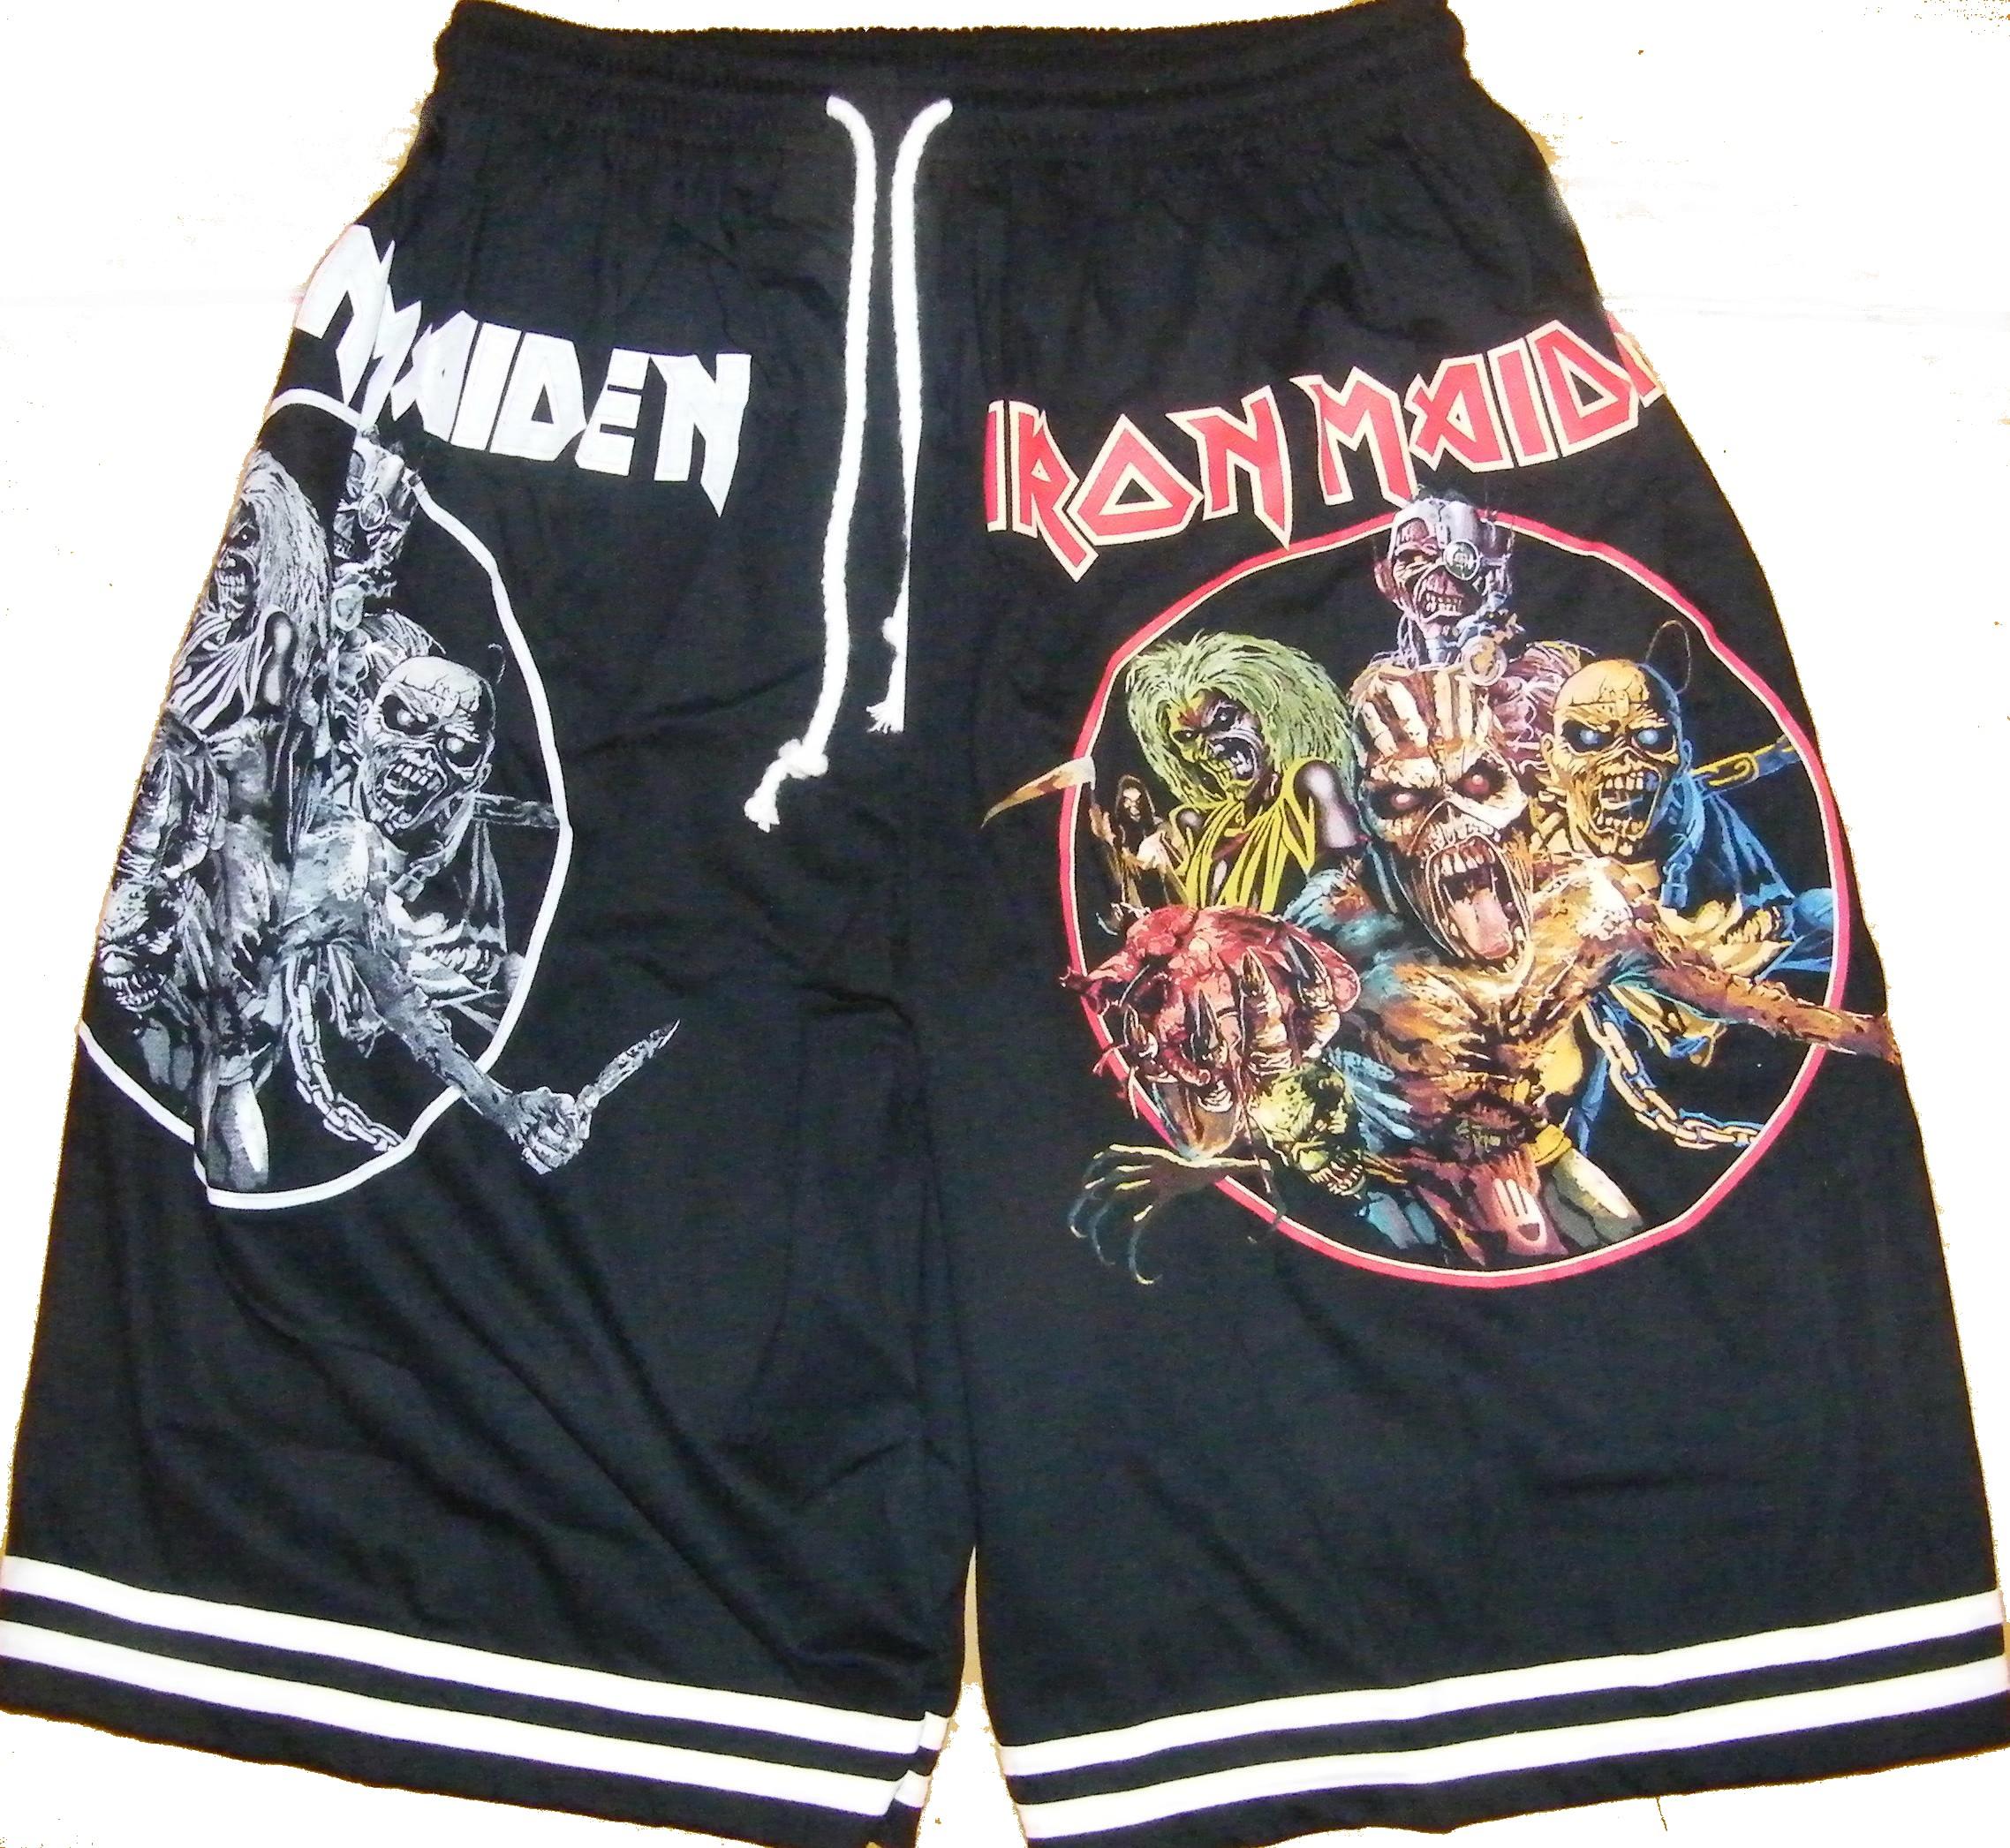 d0528b2a91a23 Iron Maiden shorts – RoxxBKK